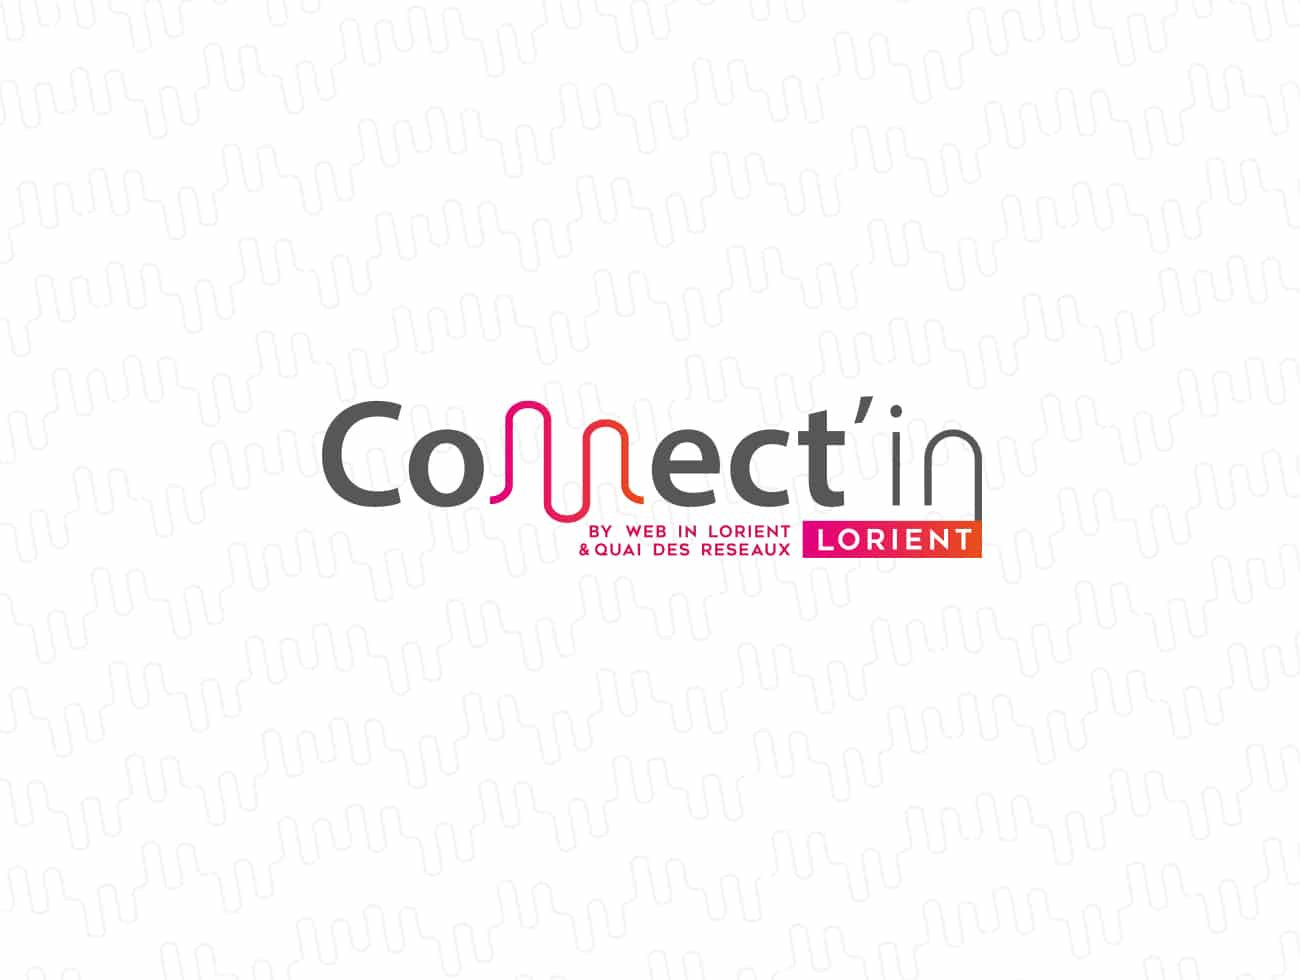 connect-in-logo-communication-bretagne-lorient